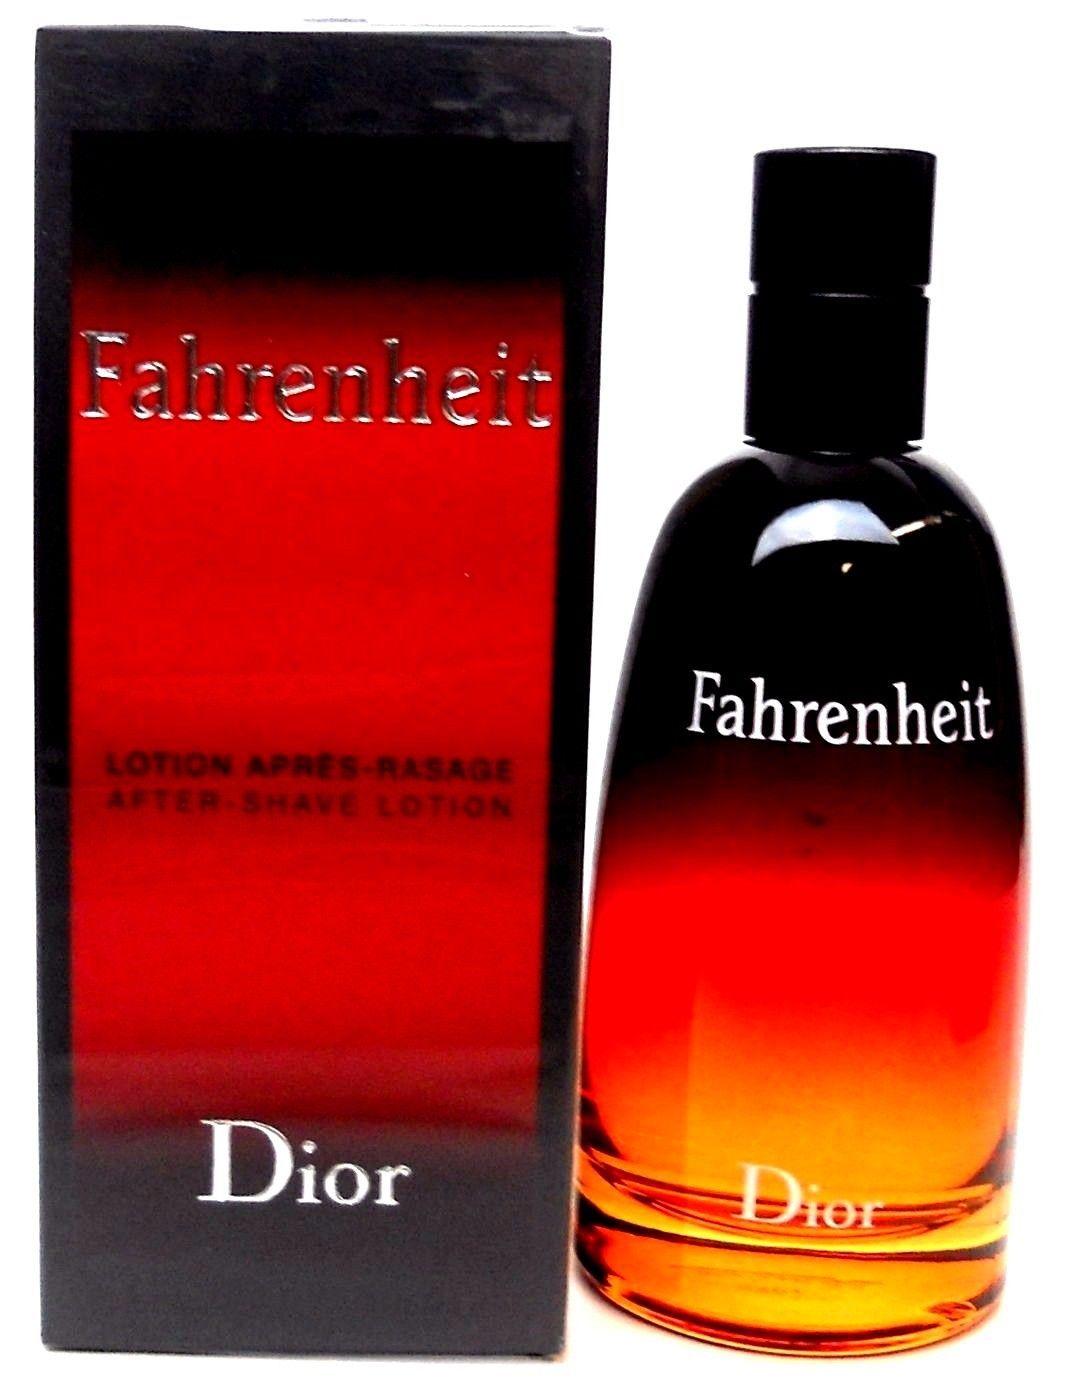 1644f5160b 49.24 | Fahrenheit After Shave Lotion Splash by Dior 3.4 oz. Brand ...